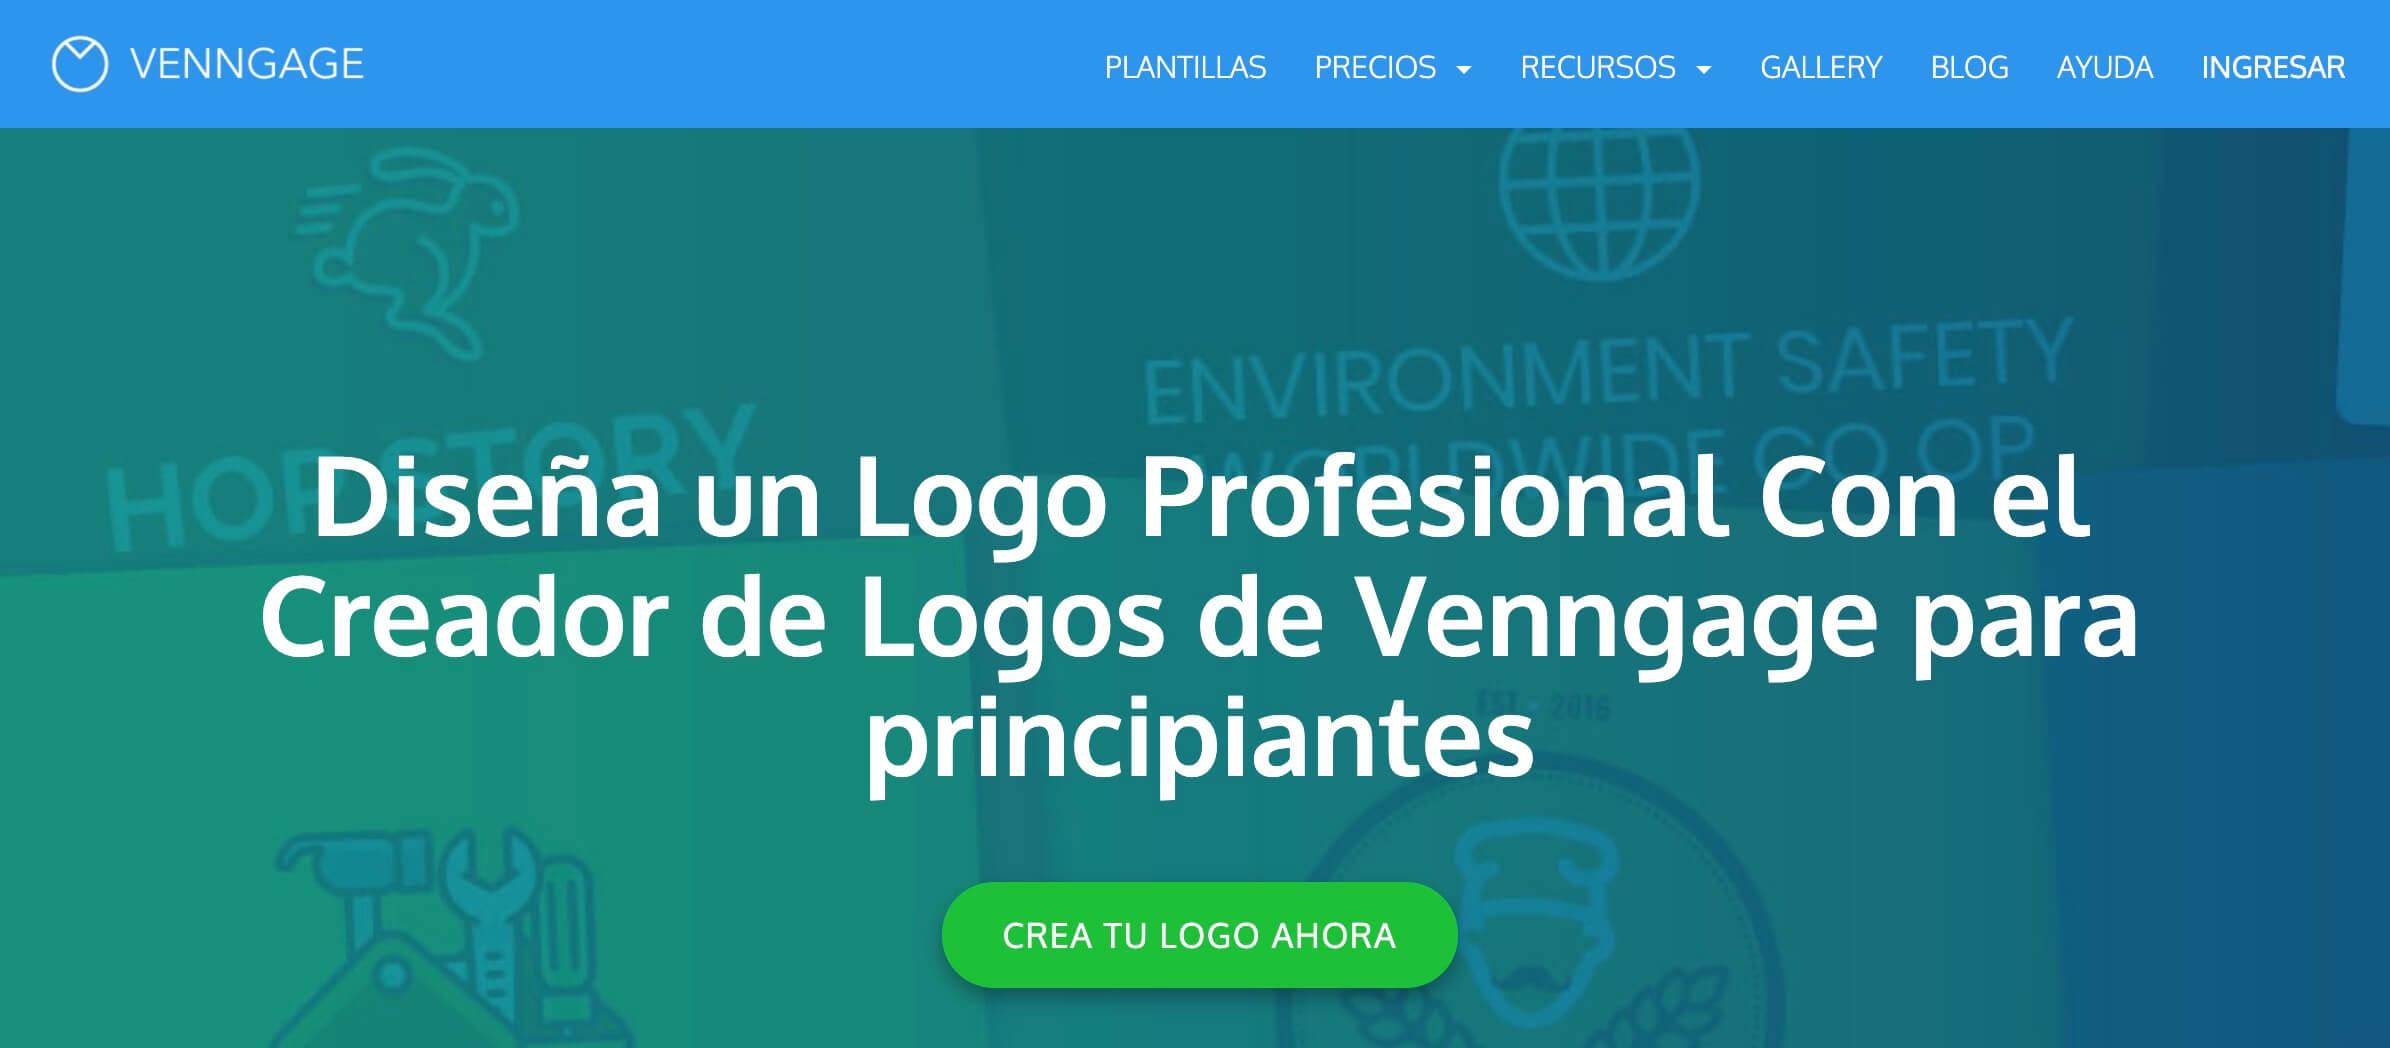 Venngage, creador de logotipos